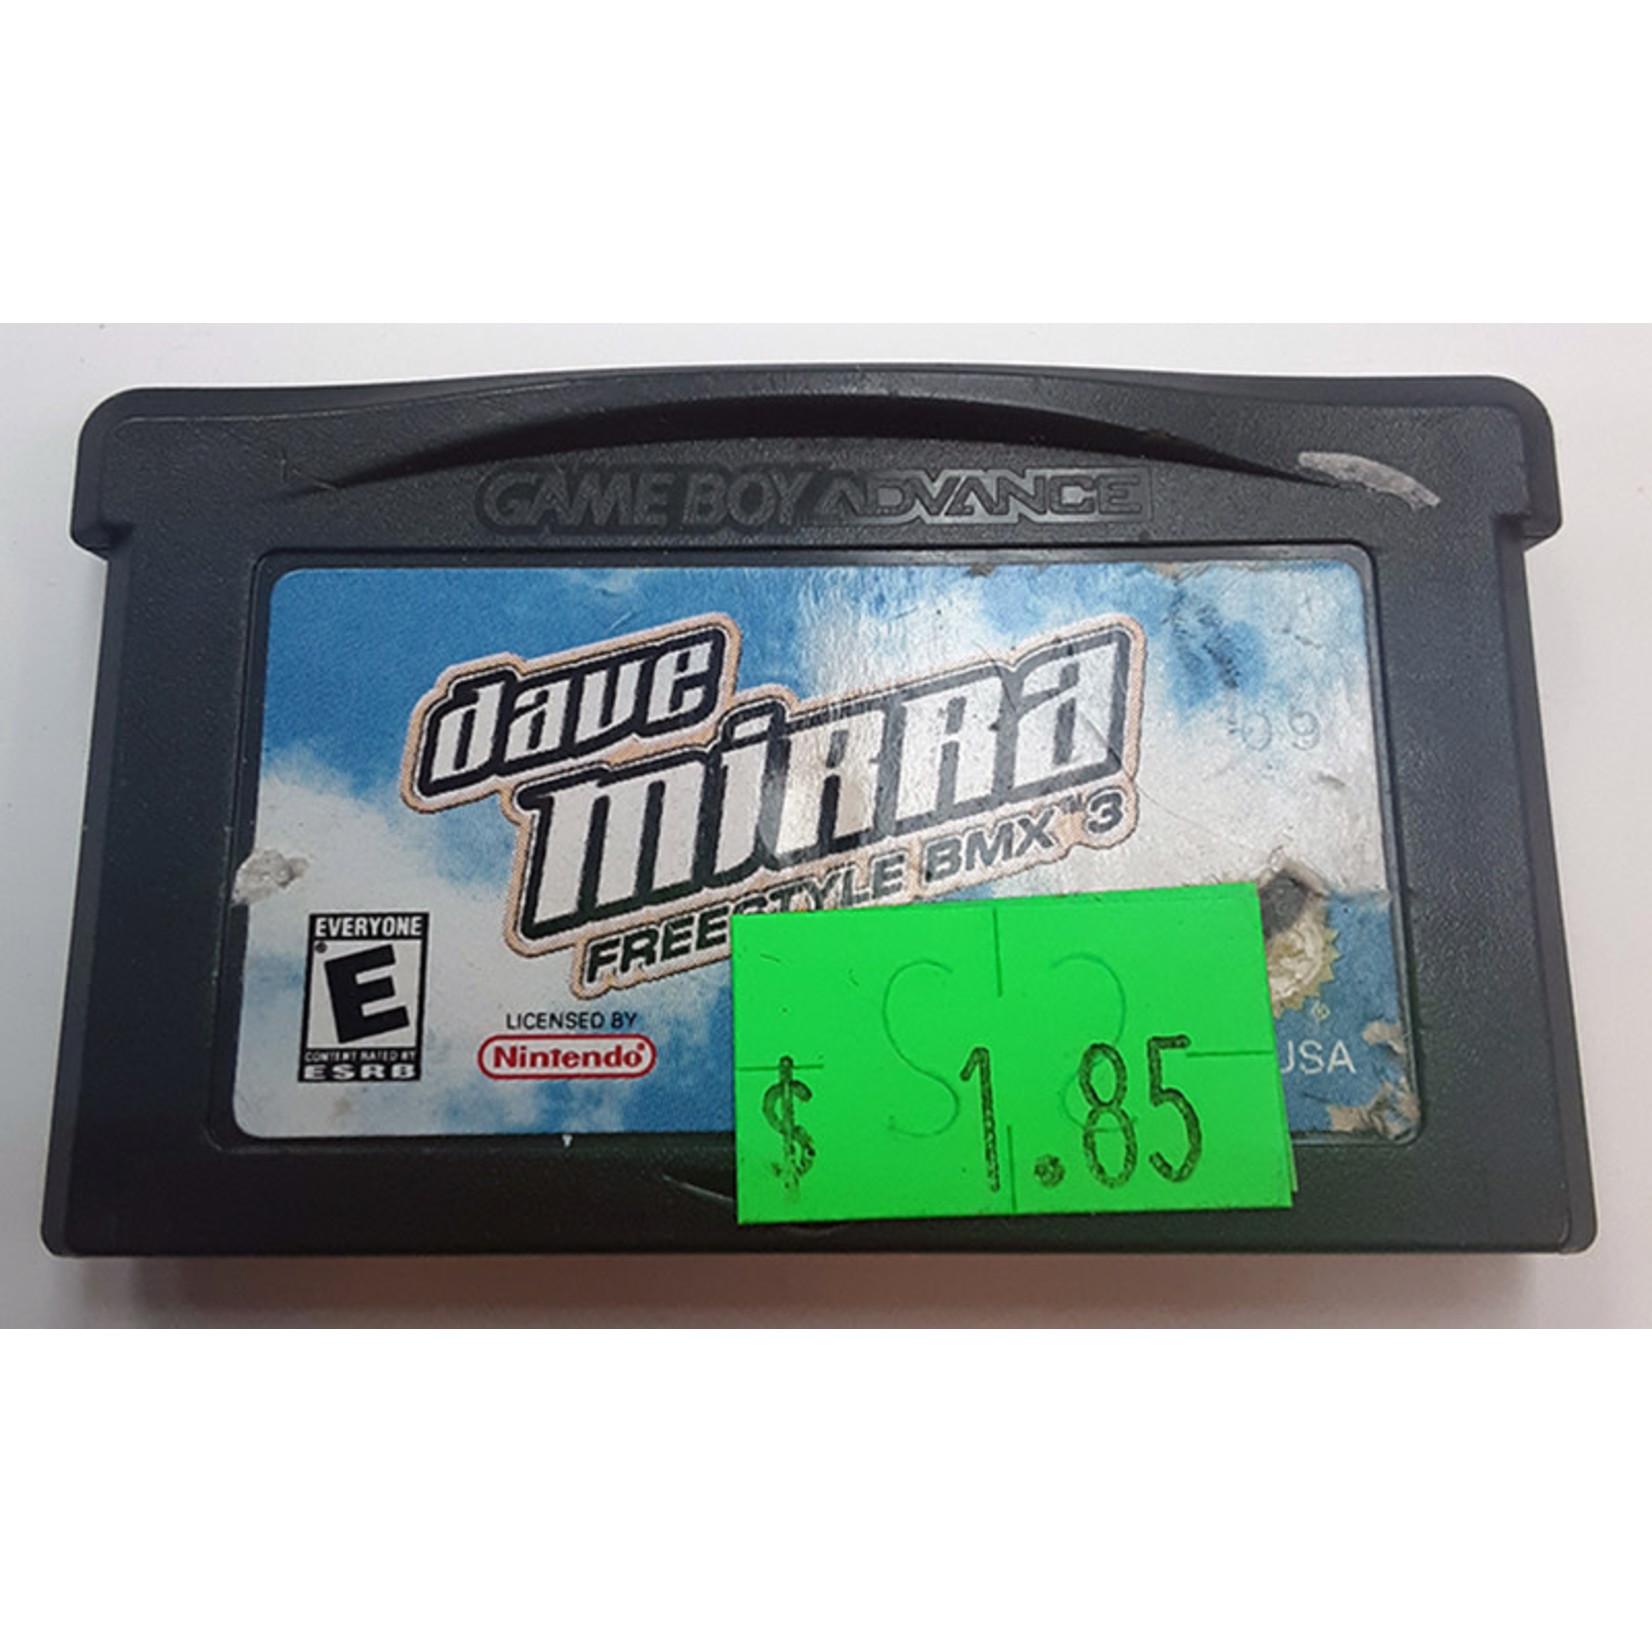 GBAu-Dave Mirra Freestyle BMX 3 (cartridge)